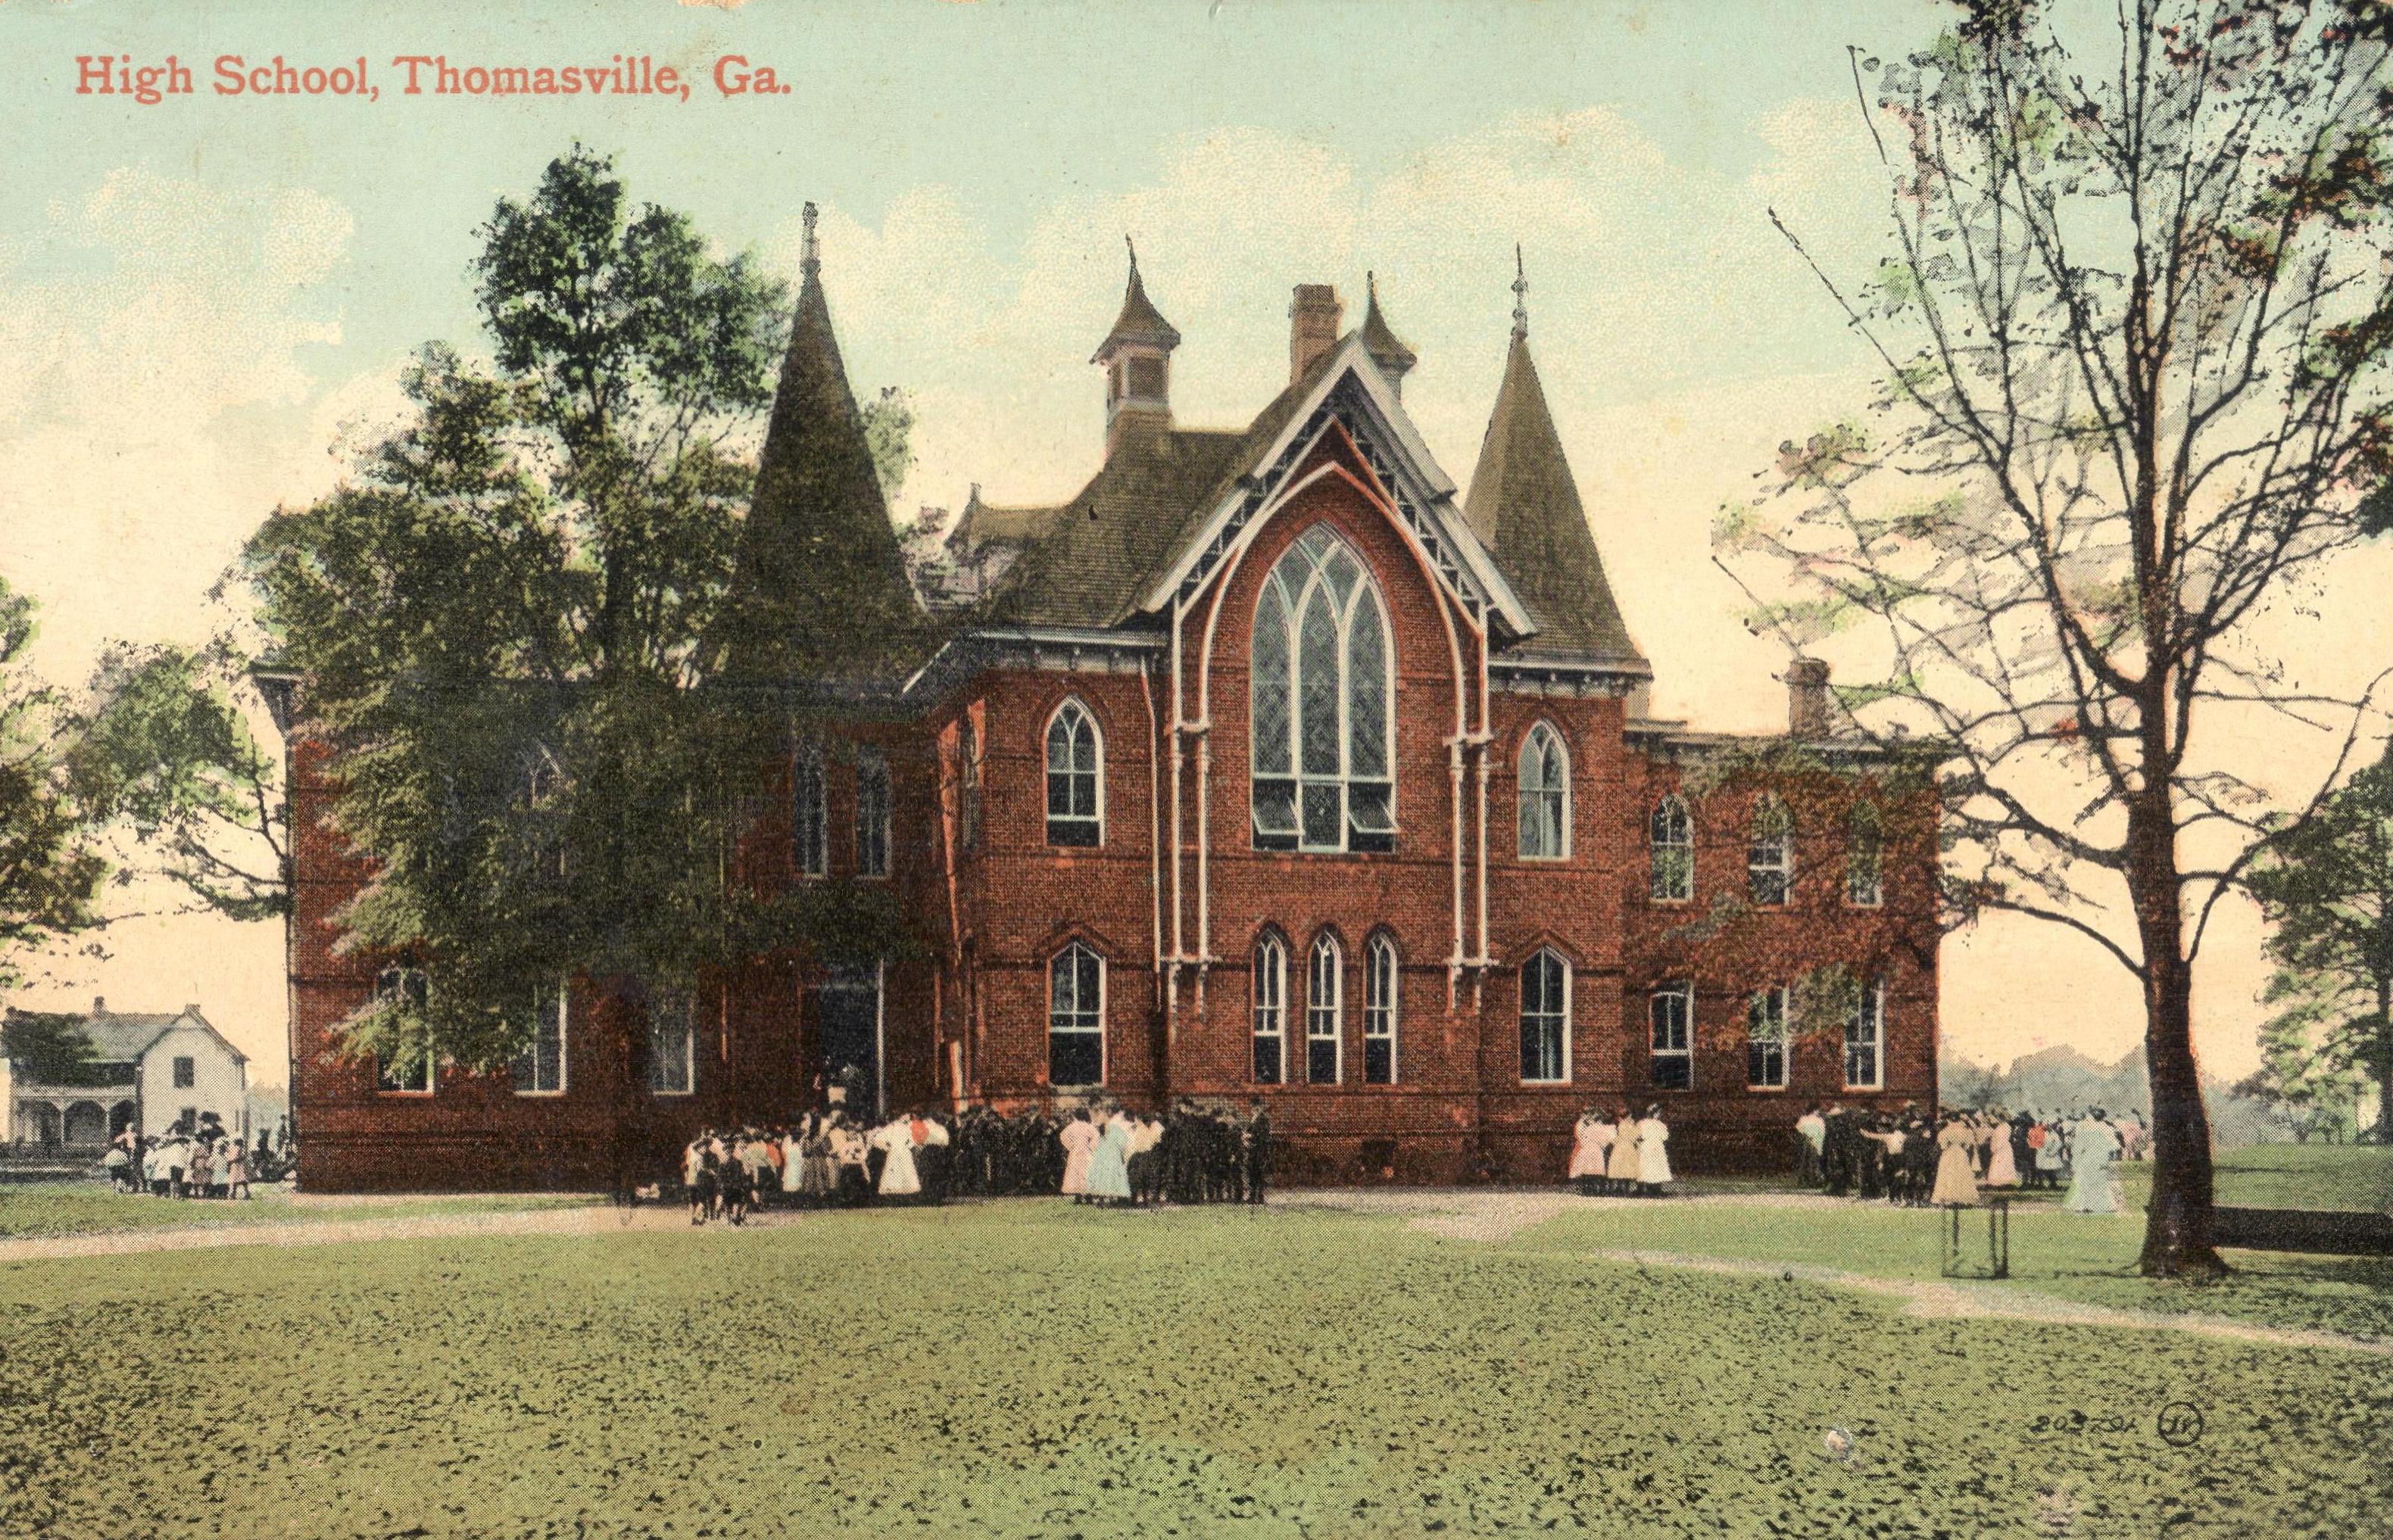 Thomasville High School in the old Fletcherville School Building, c.1901